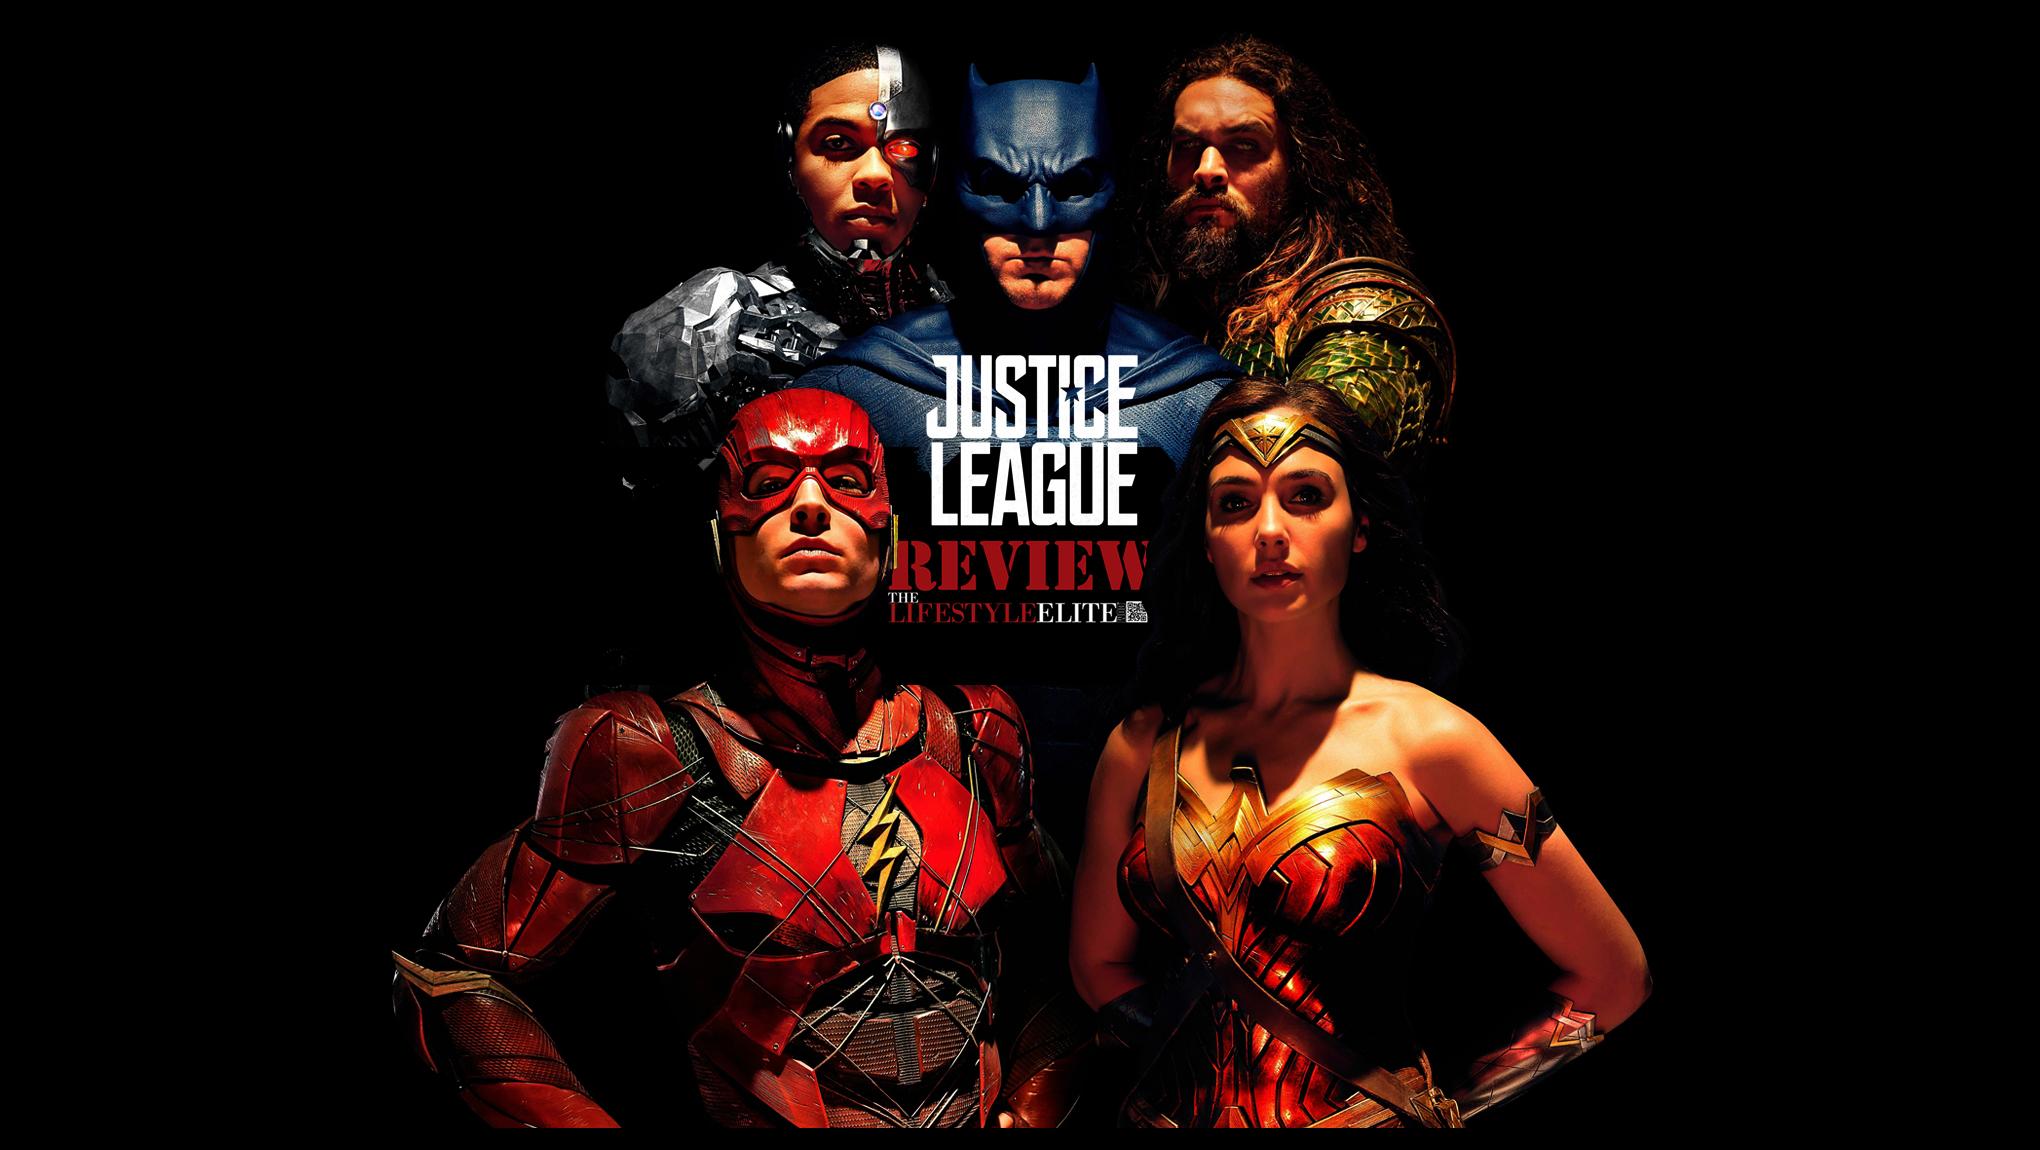 Justice League, Batman, Wonder Woman, The Flash, Flash, Cyborg, Aqua Man,cheyan antwaune gray, cheyan gray, antwaune gray, thelifestyleelite,elite lifestyle, thelifestyleelitedotcom, thelifestyleelite.com,tlselite.com,TheLifeStyleElite.com,cheyan antwaune gray,fashion,models of thelifestyleelite.com, the life style elite,the lifestyle elite,elite lifestyle,lifestyleelite.com,cheyan gray,TLSElite,TLSElite.com,TLSEliteGaming,TLSElite Gaming